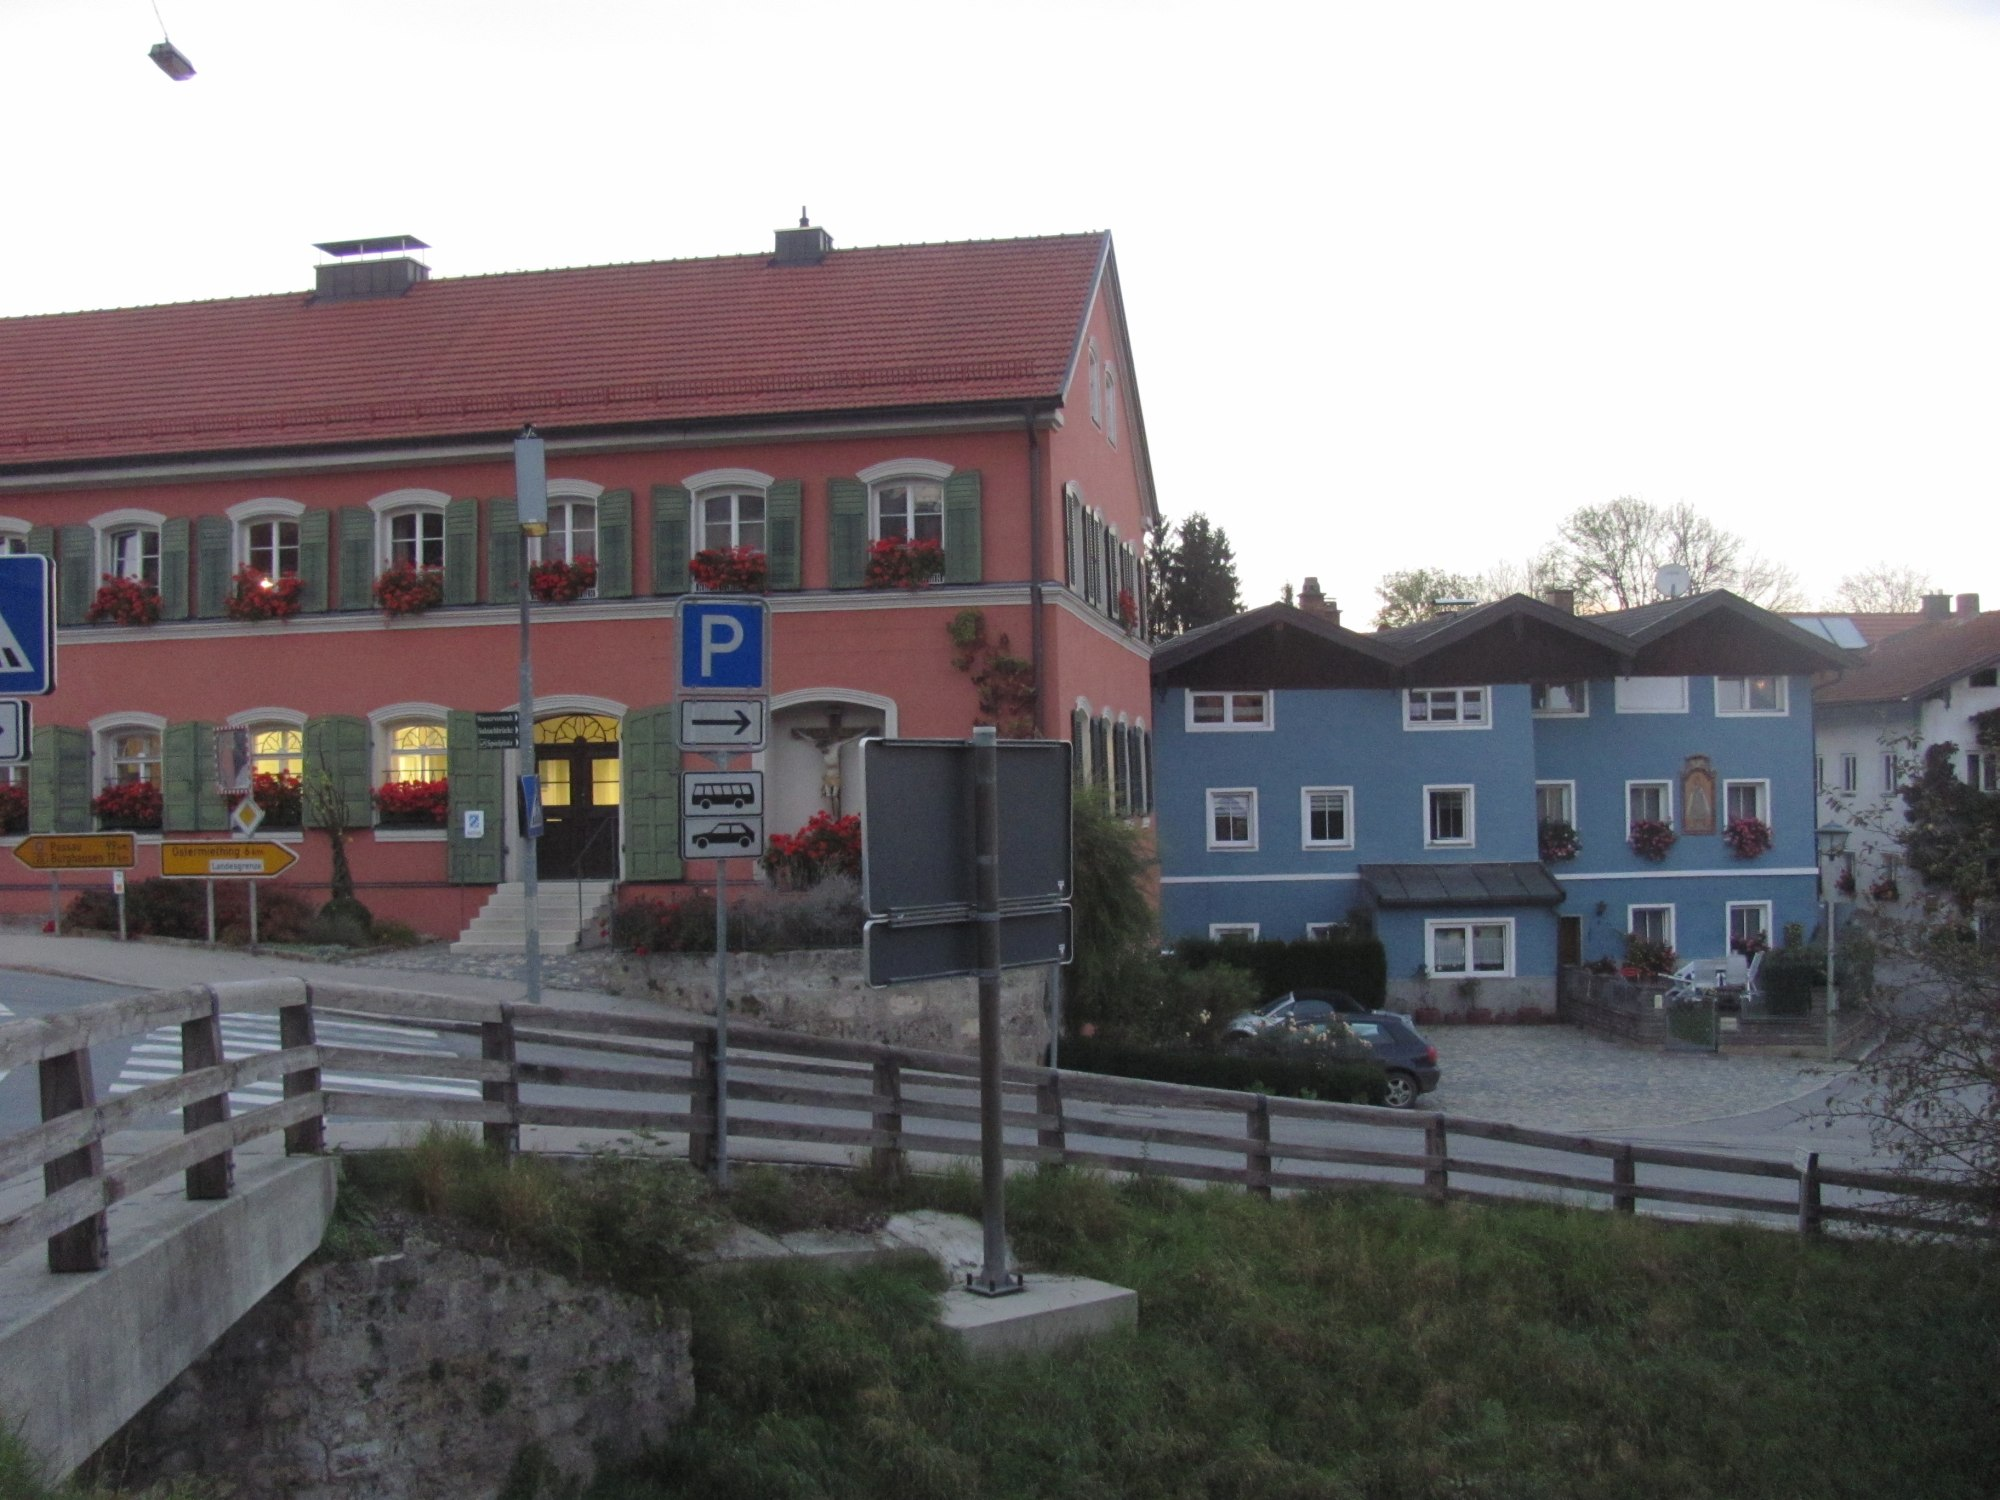 Billige Hotels Munchen Umgebung